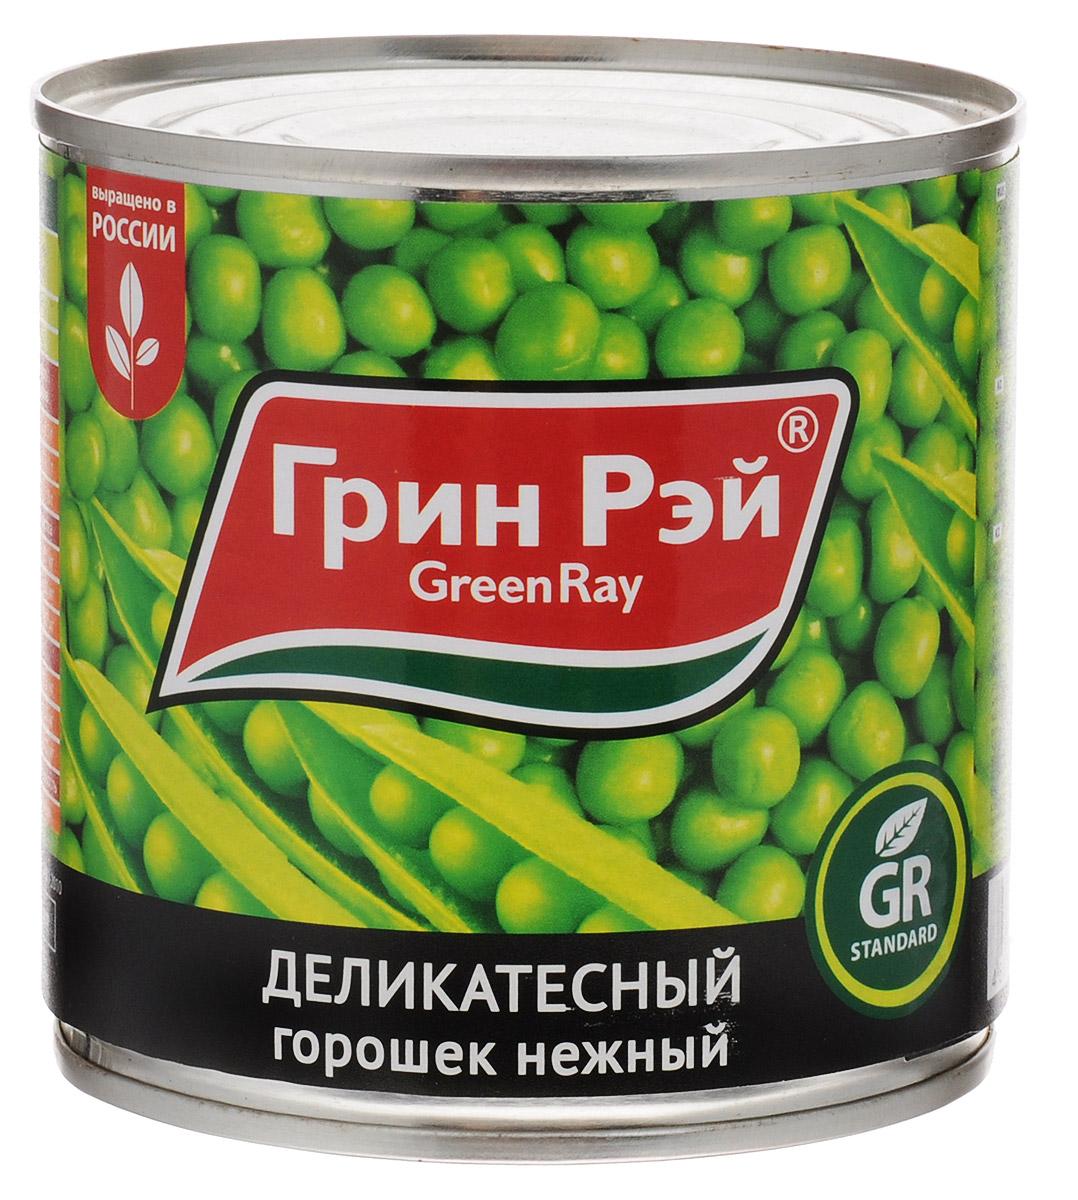 Green Ray Деликатесный горошек зеленый, 425 мл stollenwerk горошек молодой деликатесный 720 мл